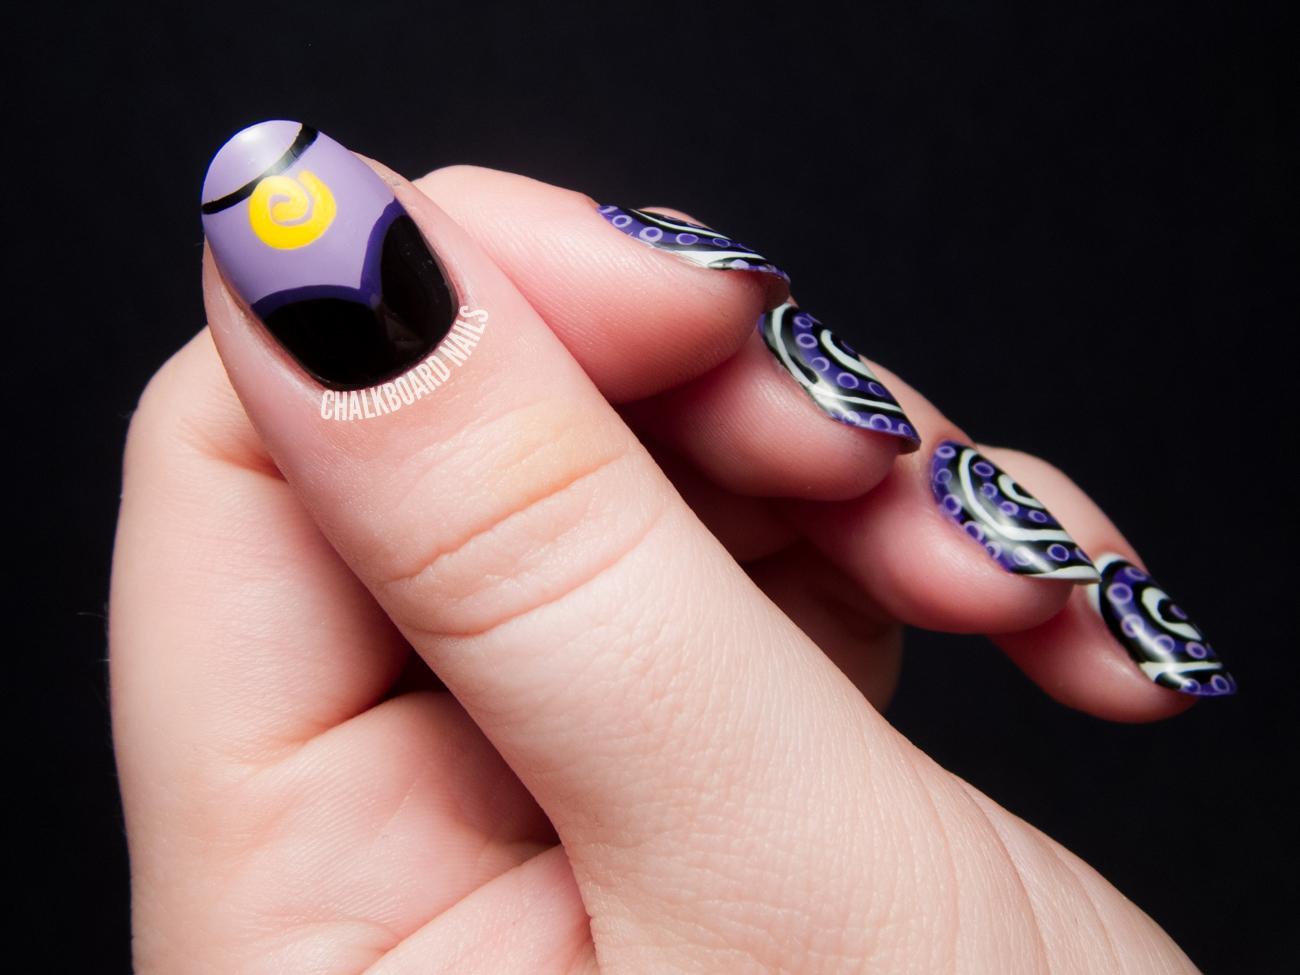 The Disney Diva - Ursula Nail Art | Chalkboard Nails | Nail Art Blog